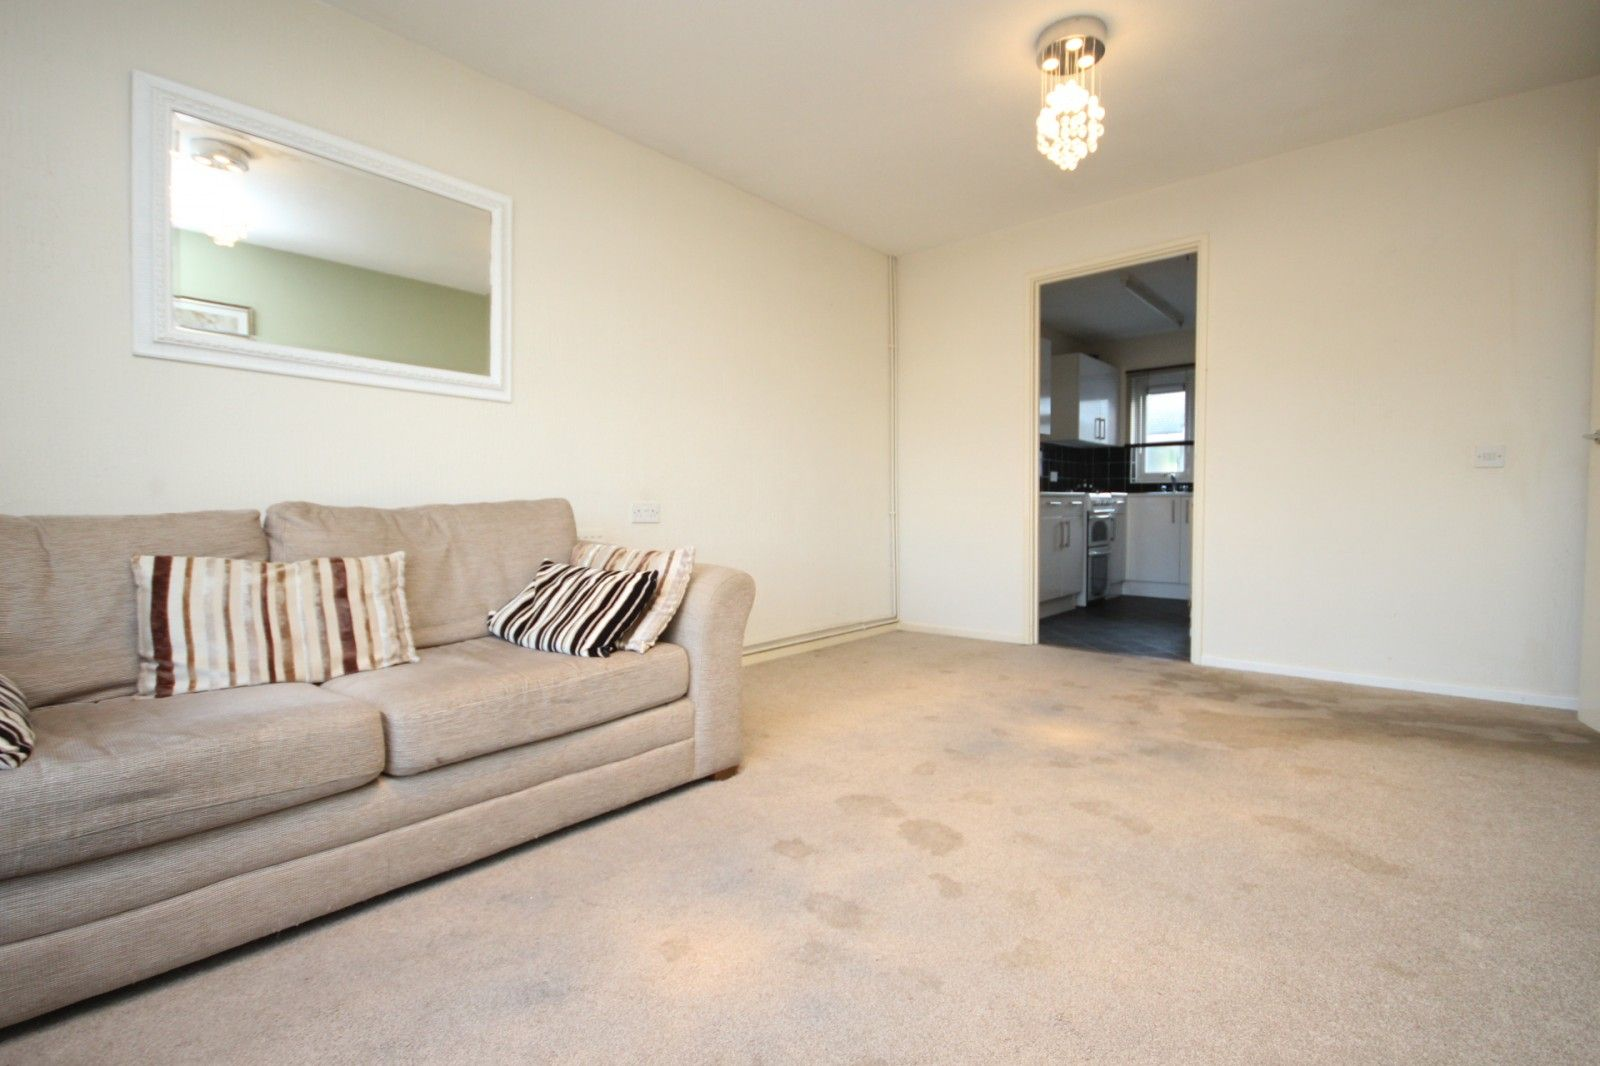 Property photo 1 of 7. Lounge (Main)